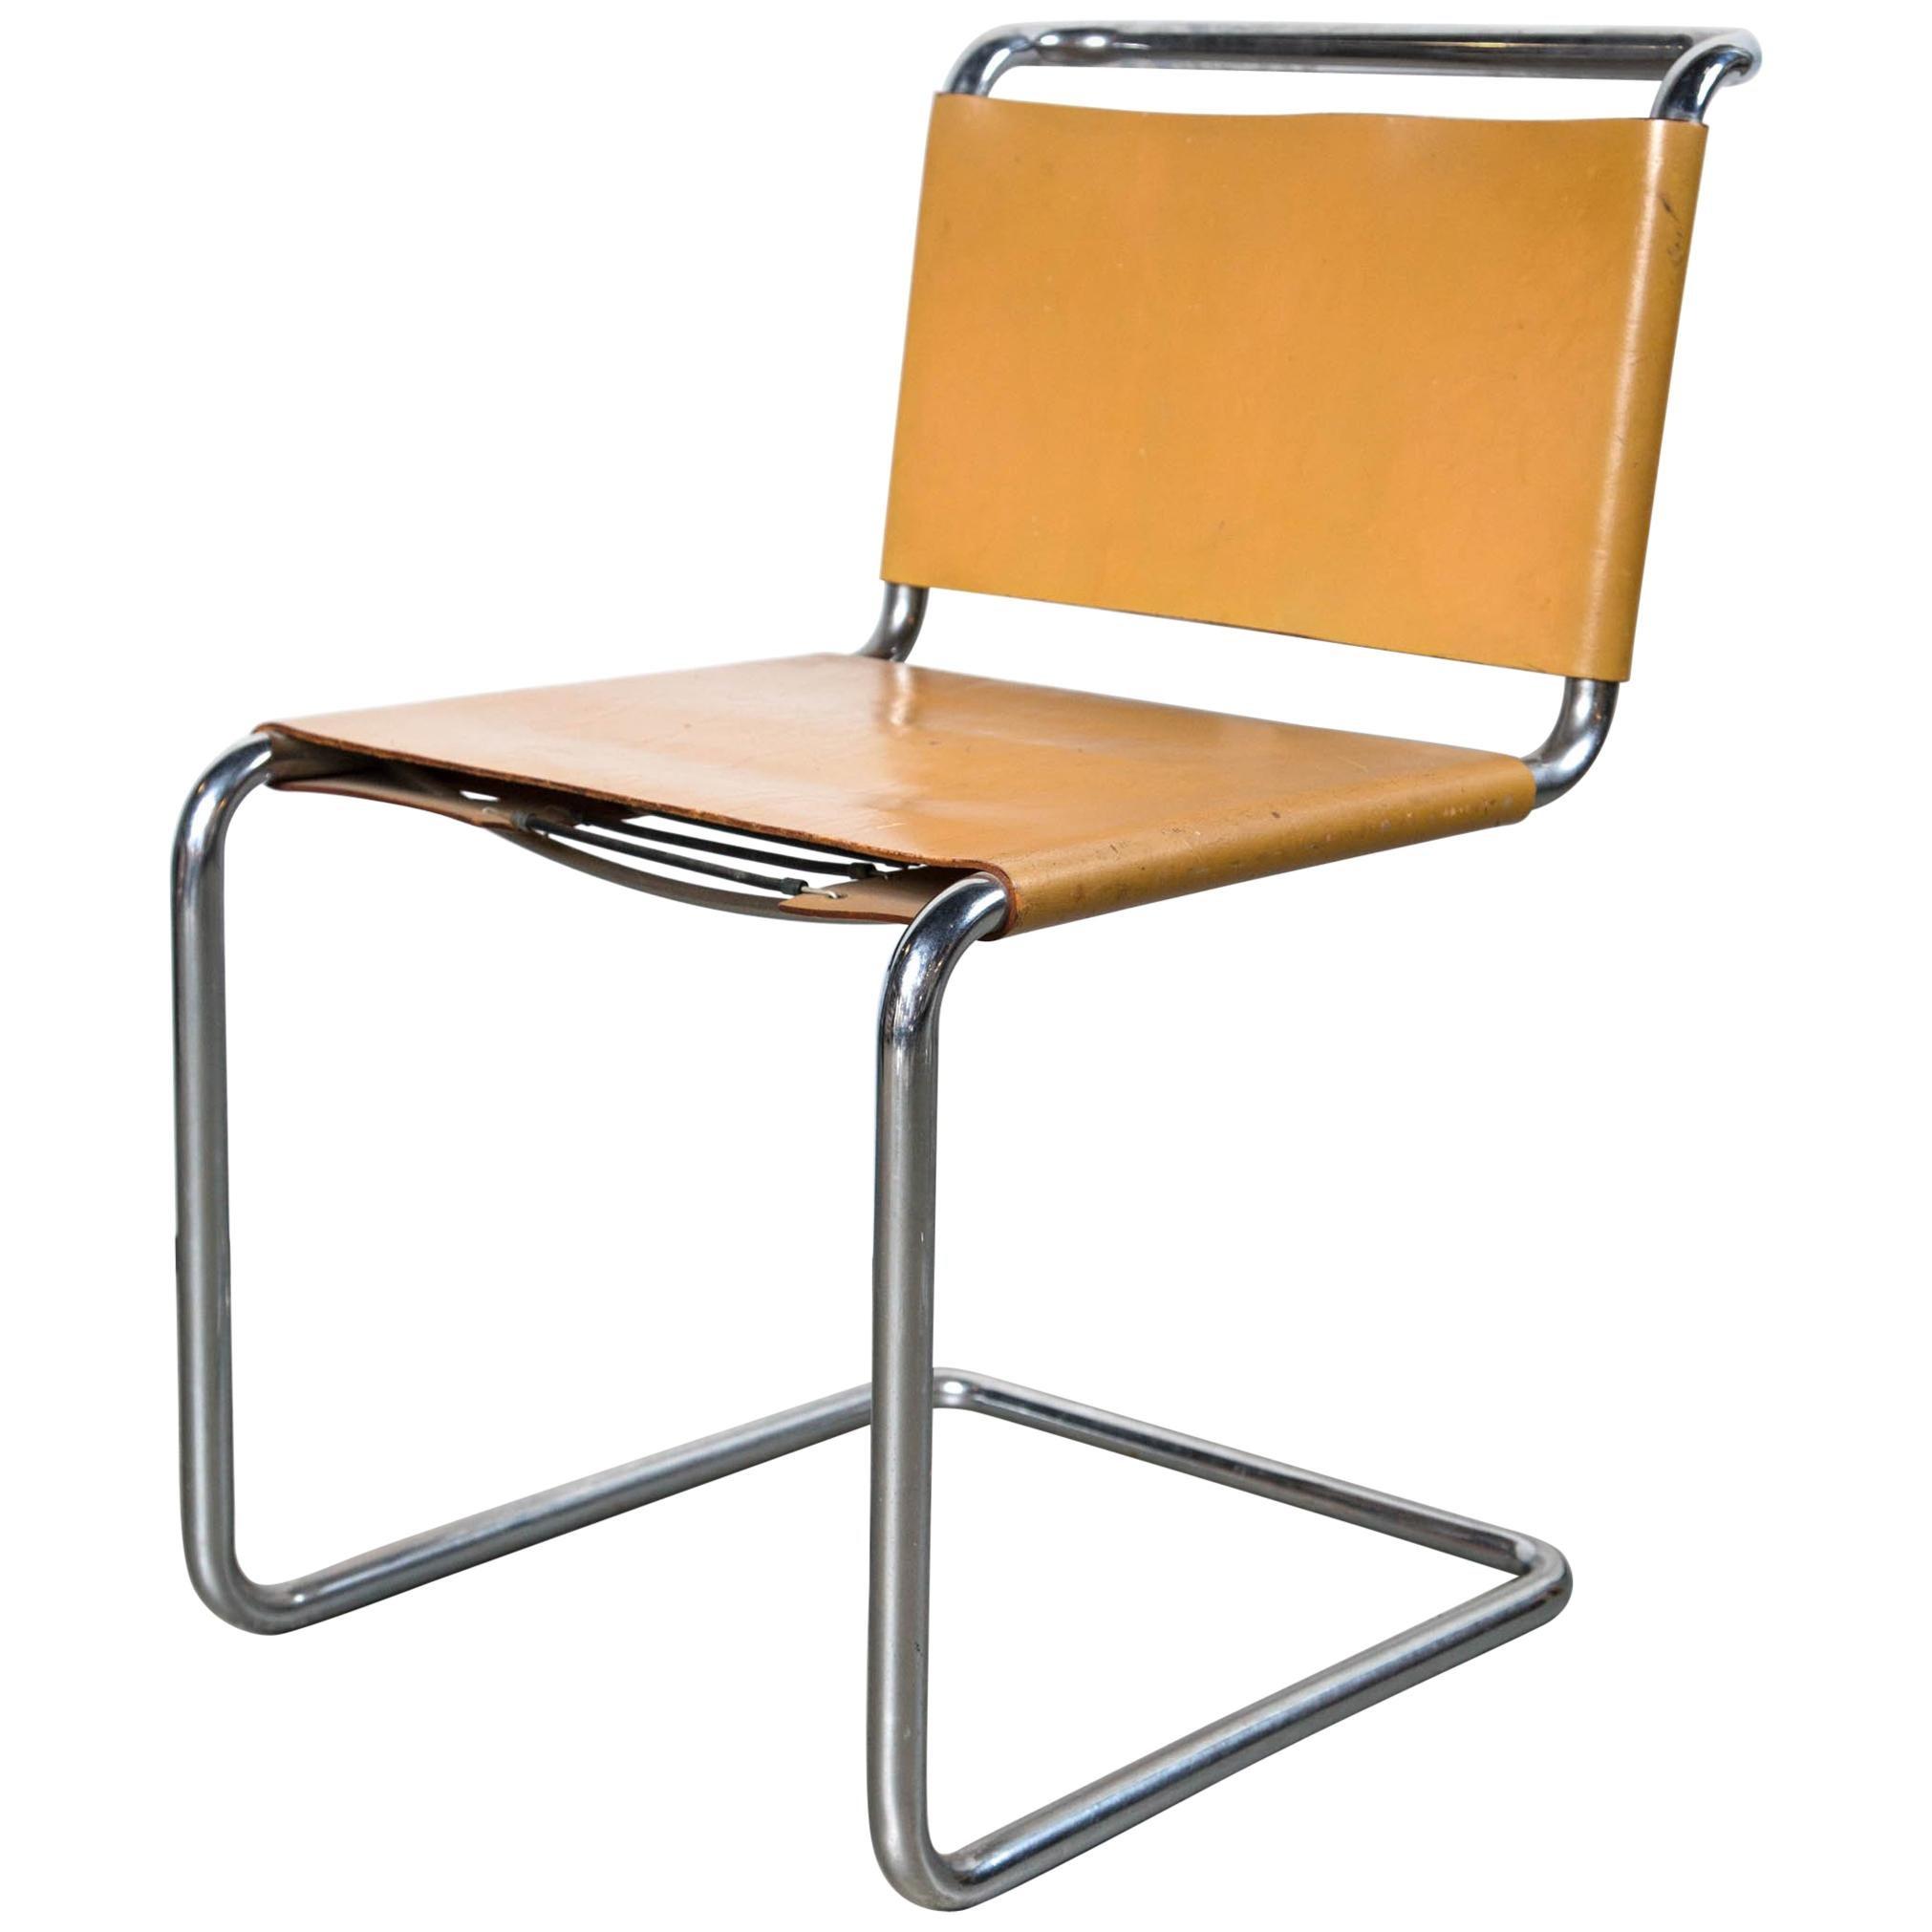 Vintage Leather Marcel Breuer Chrome Chairs For Sale  sc 1 st  1stDibs & Vintage Leather Marcel Breuer Chrome Chairs For Sale at 1stdibs